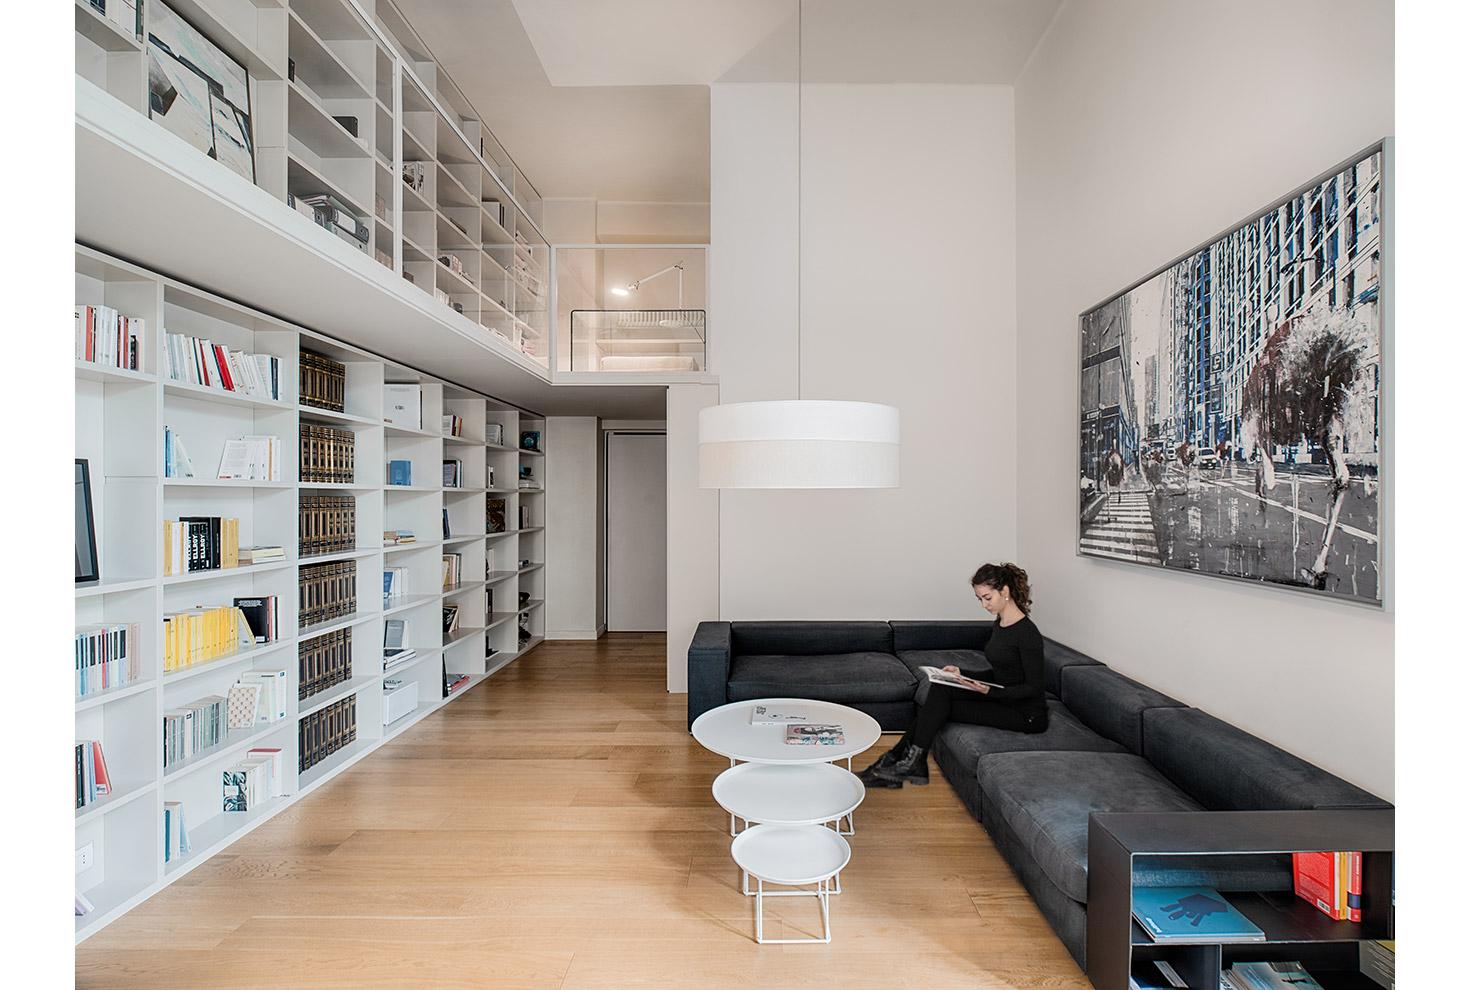 marco-tacchini-fotografo-architettura-torino-maat-architettura_03